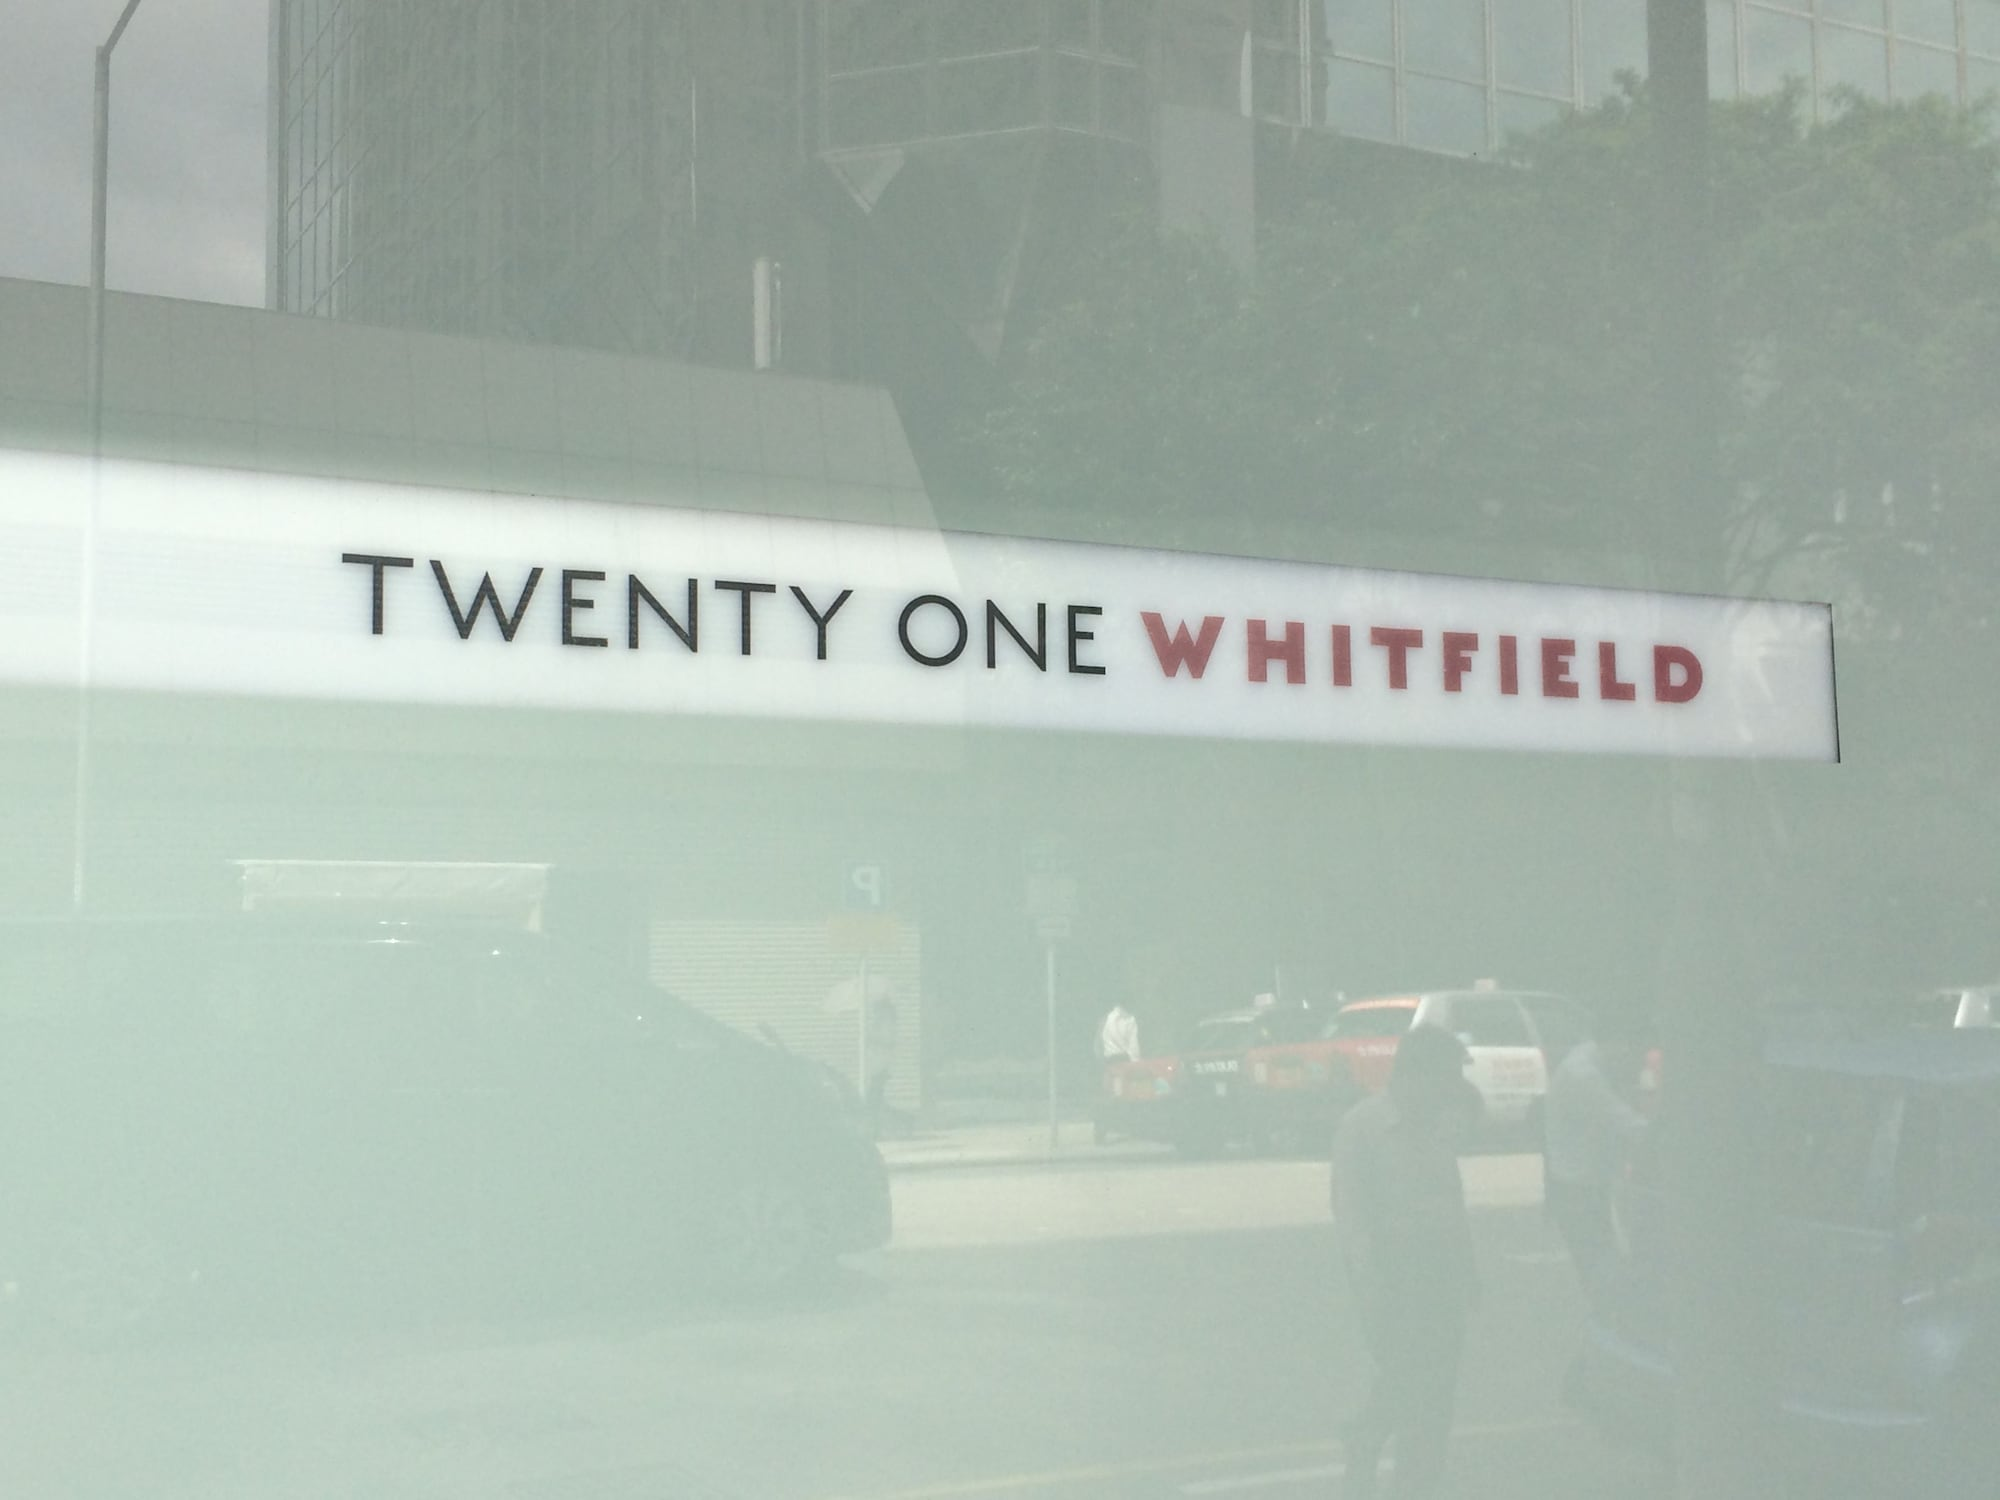 Twenty One Whitfield, Eastern